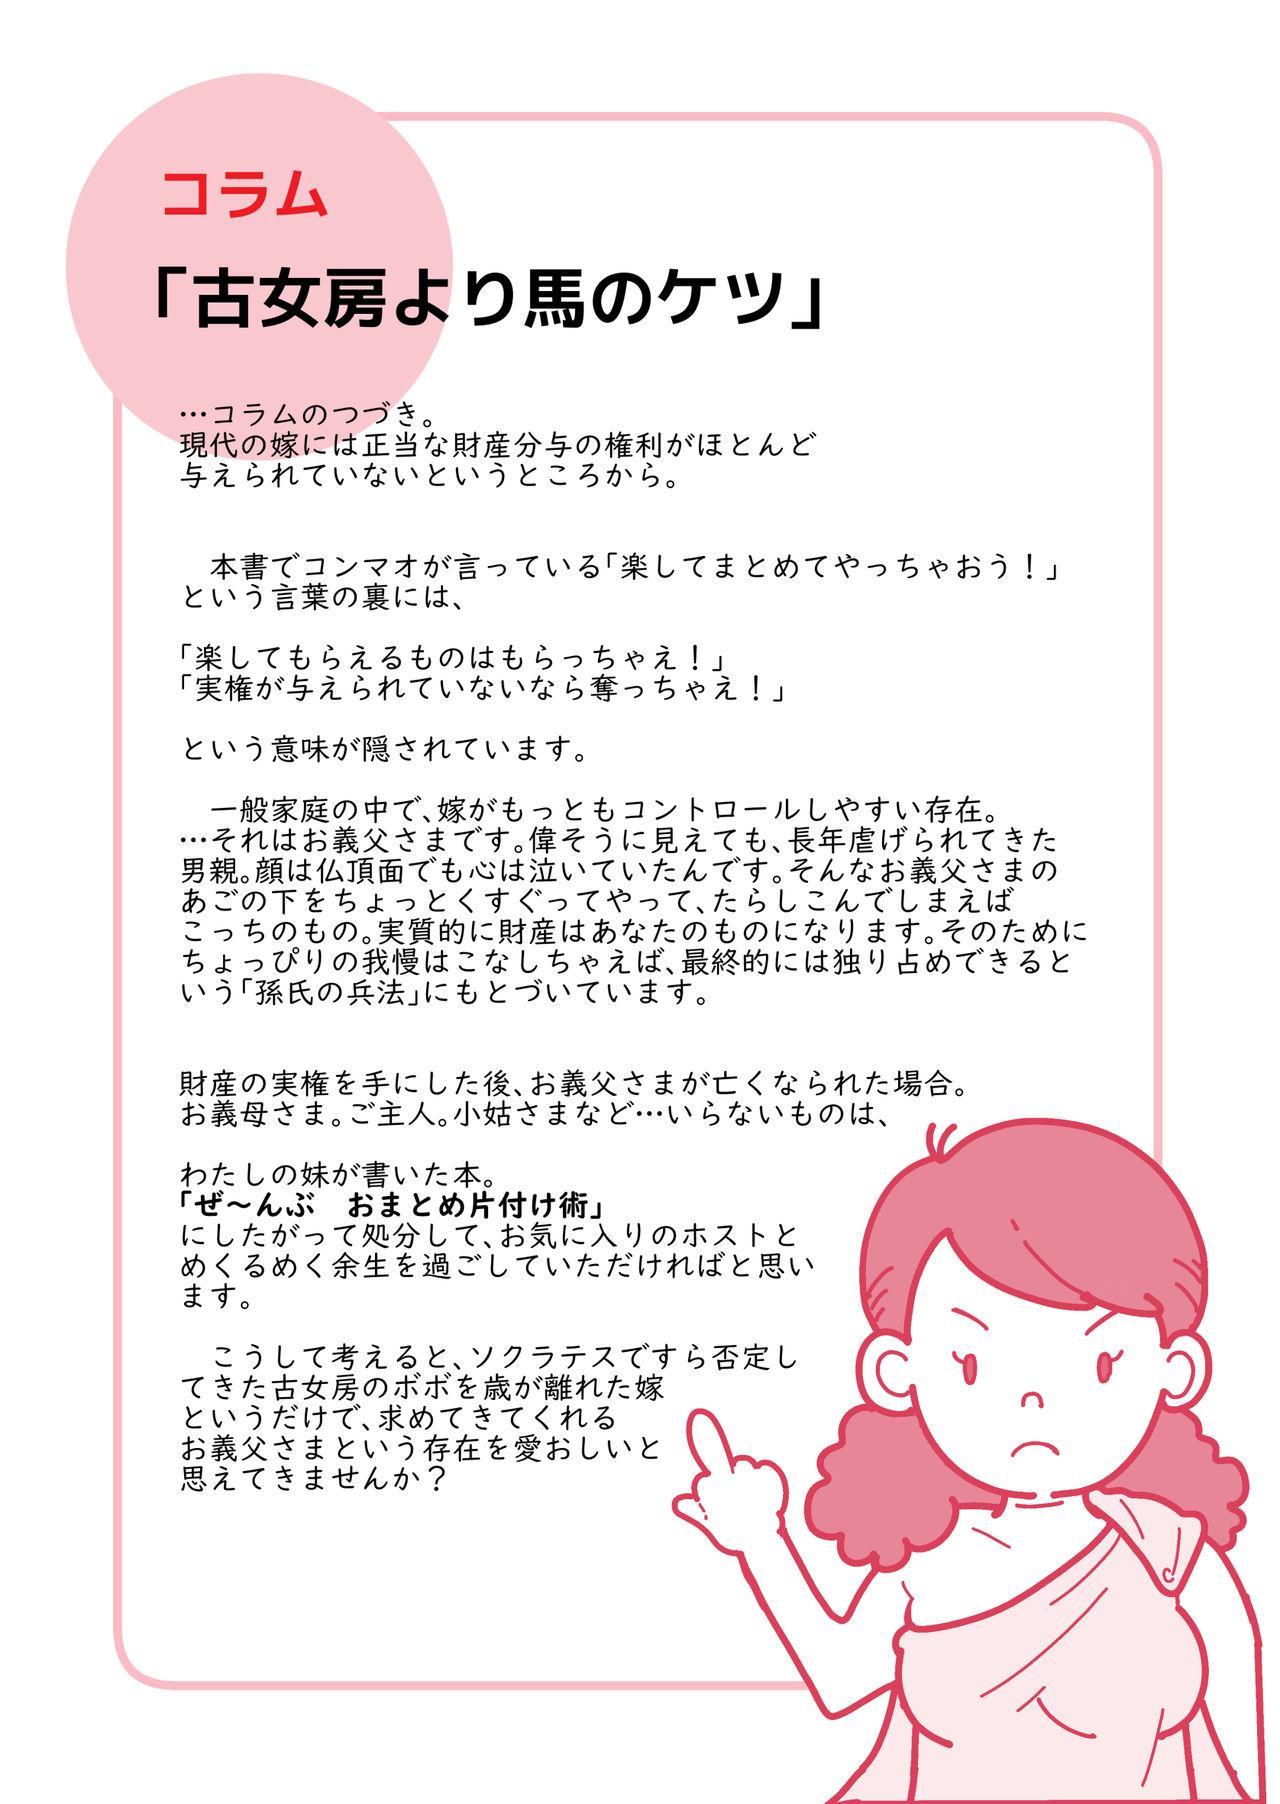 Isogasii Okaasan No Tamuno Sasa Rouzin Seikaigo | Guide for Elderly Sex Health Care to Busy Mom 45